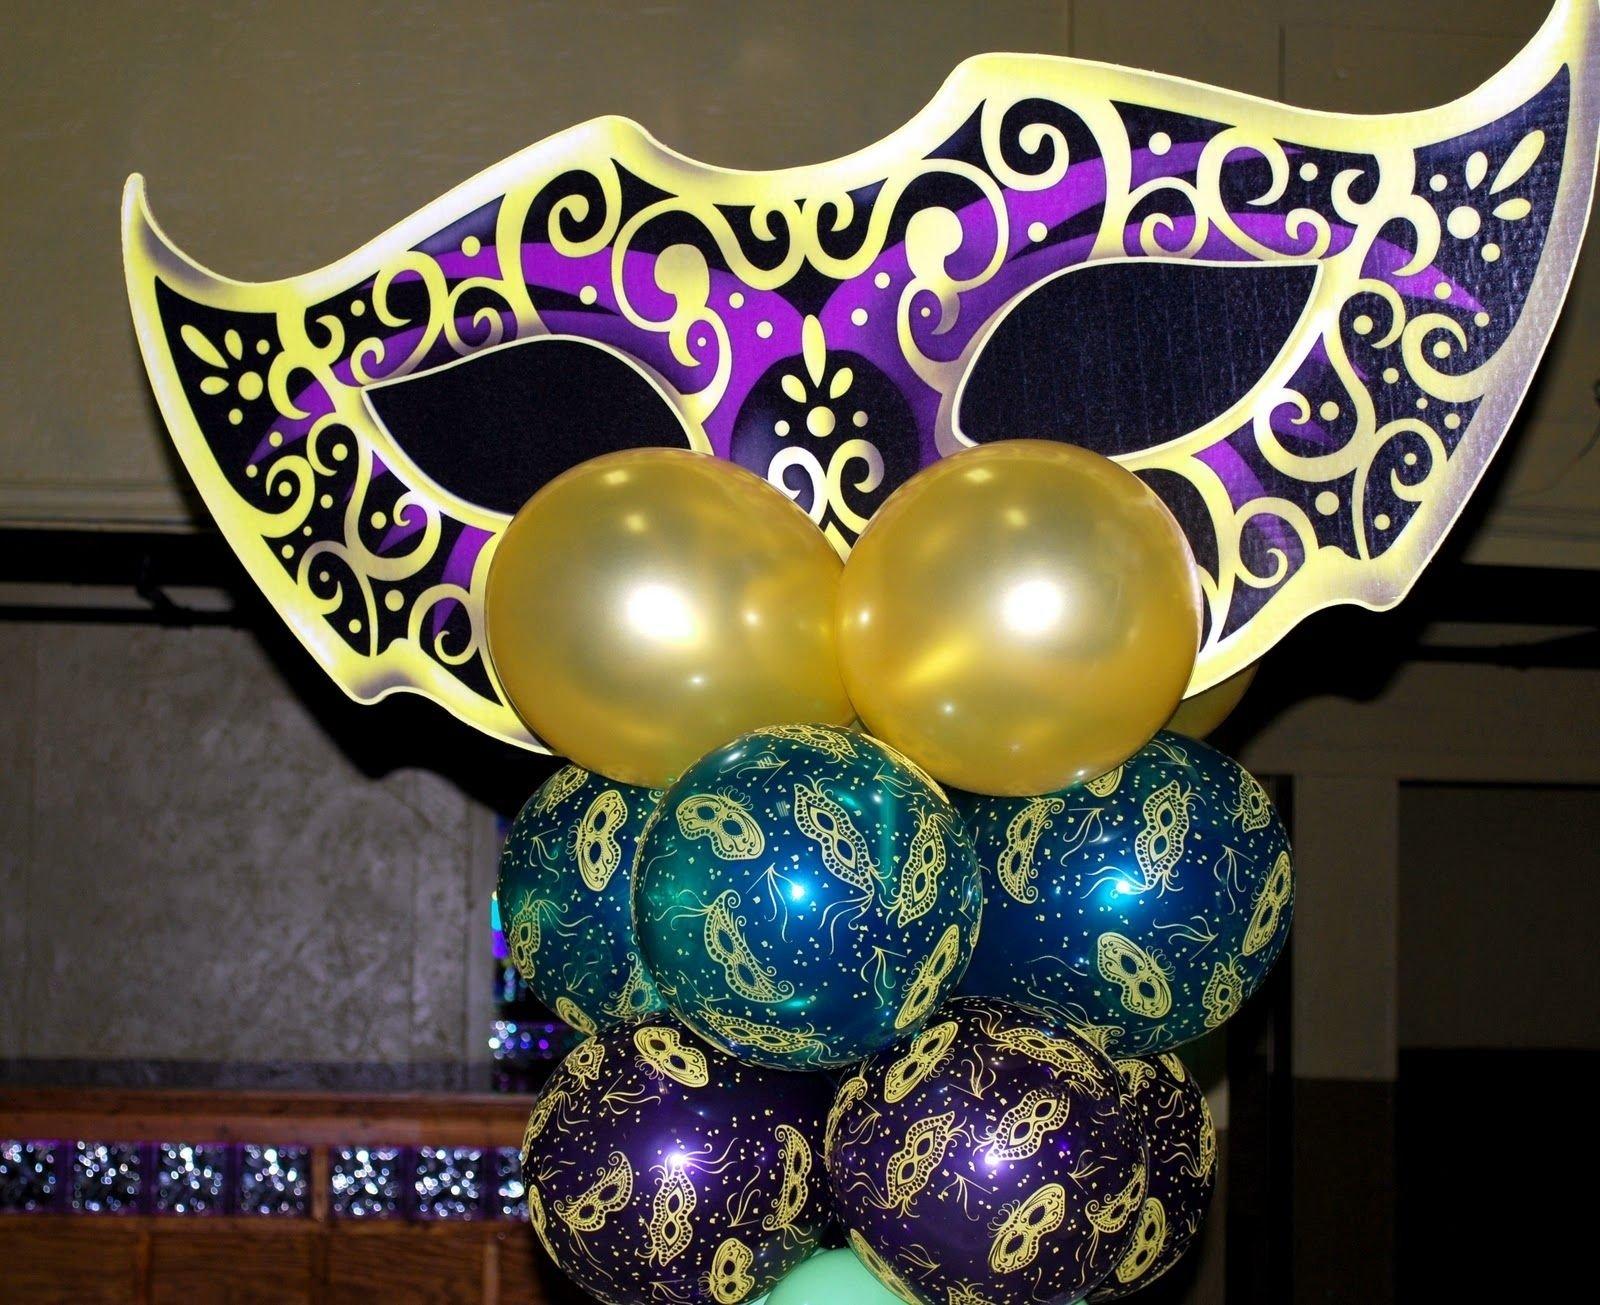 10 Elegant Masquerade Party Ideas Sweet 16 sweet sixteen masquerade party favors sweet 16 nicoles sweet 16 2020